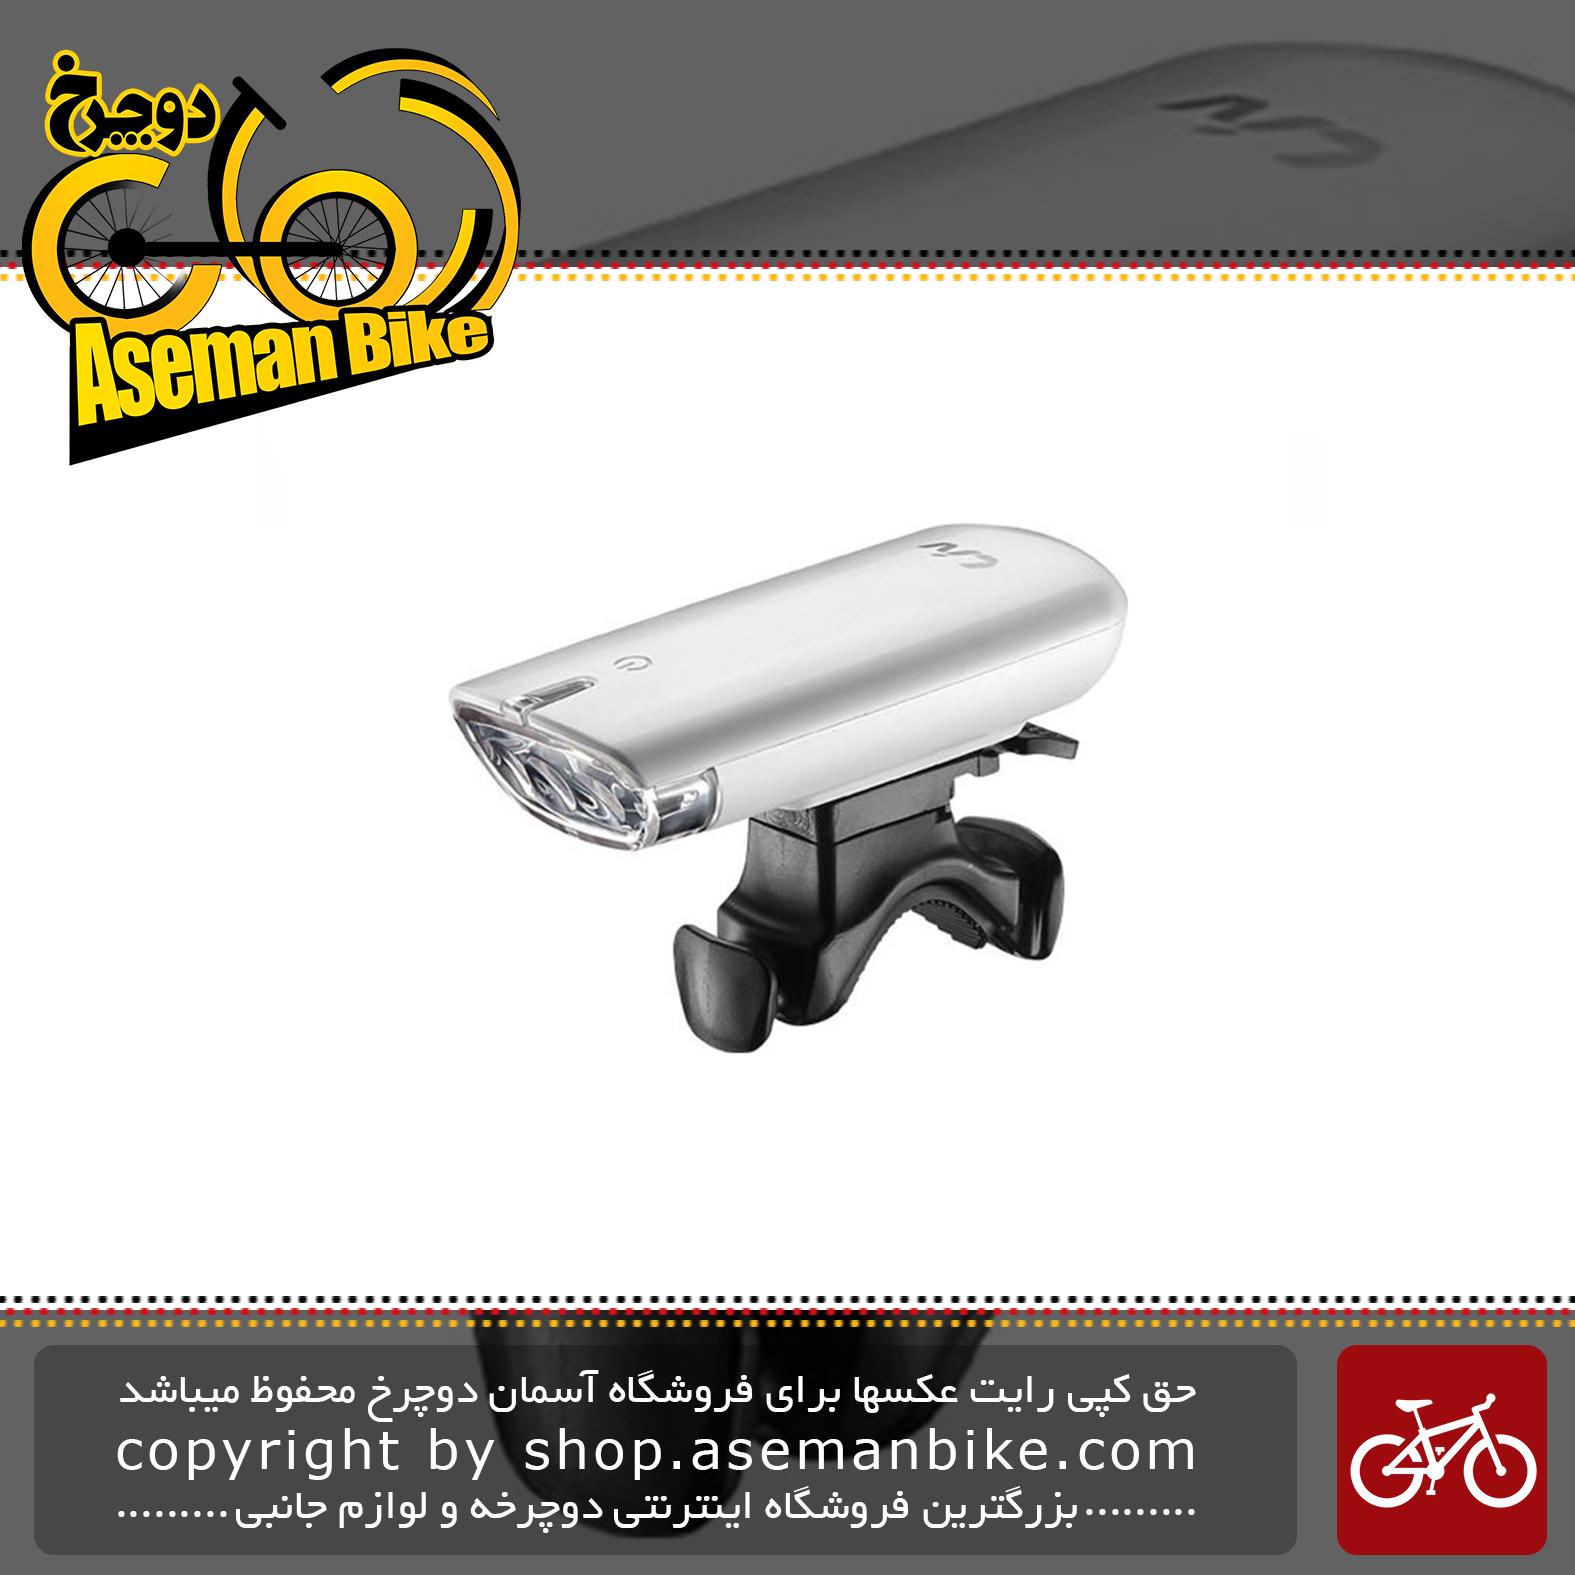 چراغ دوچرخه لیو مدل ان وای ایکس اچ ال 3 Bicycle Safety Light NYX HL3